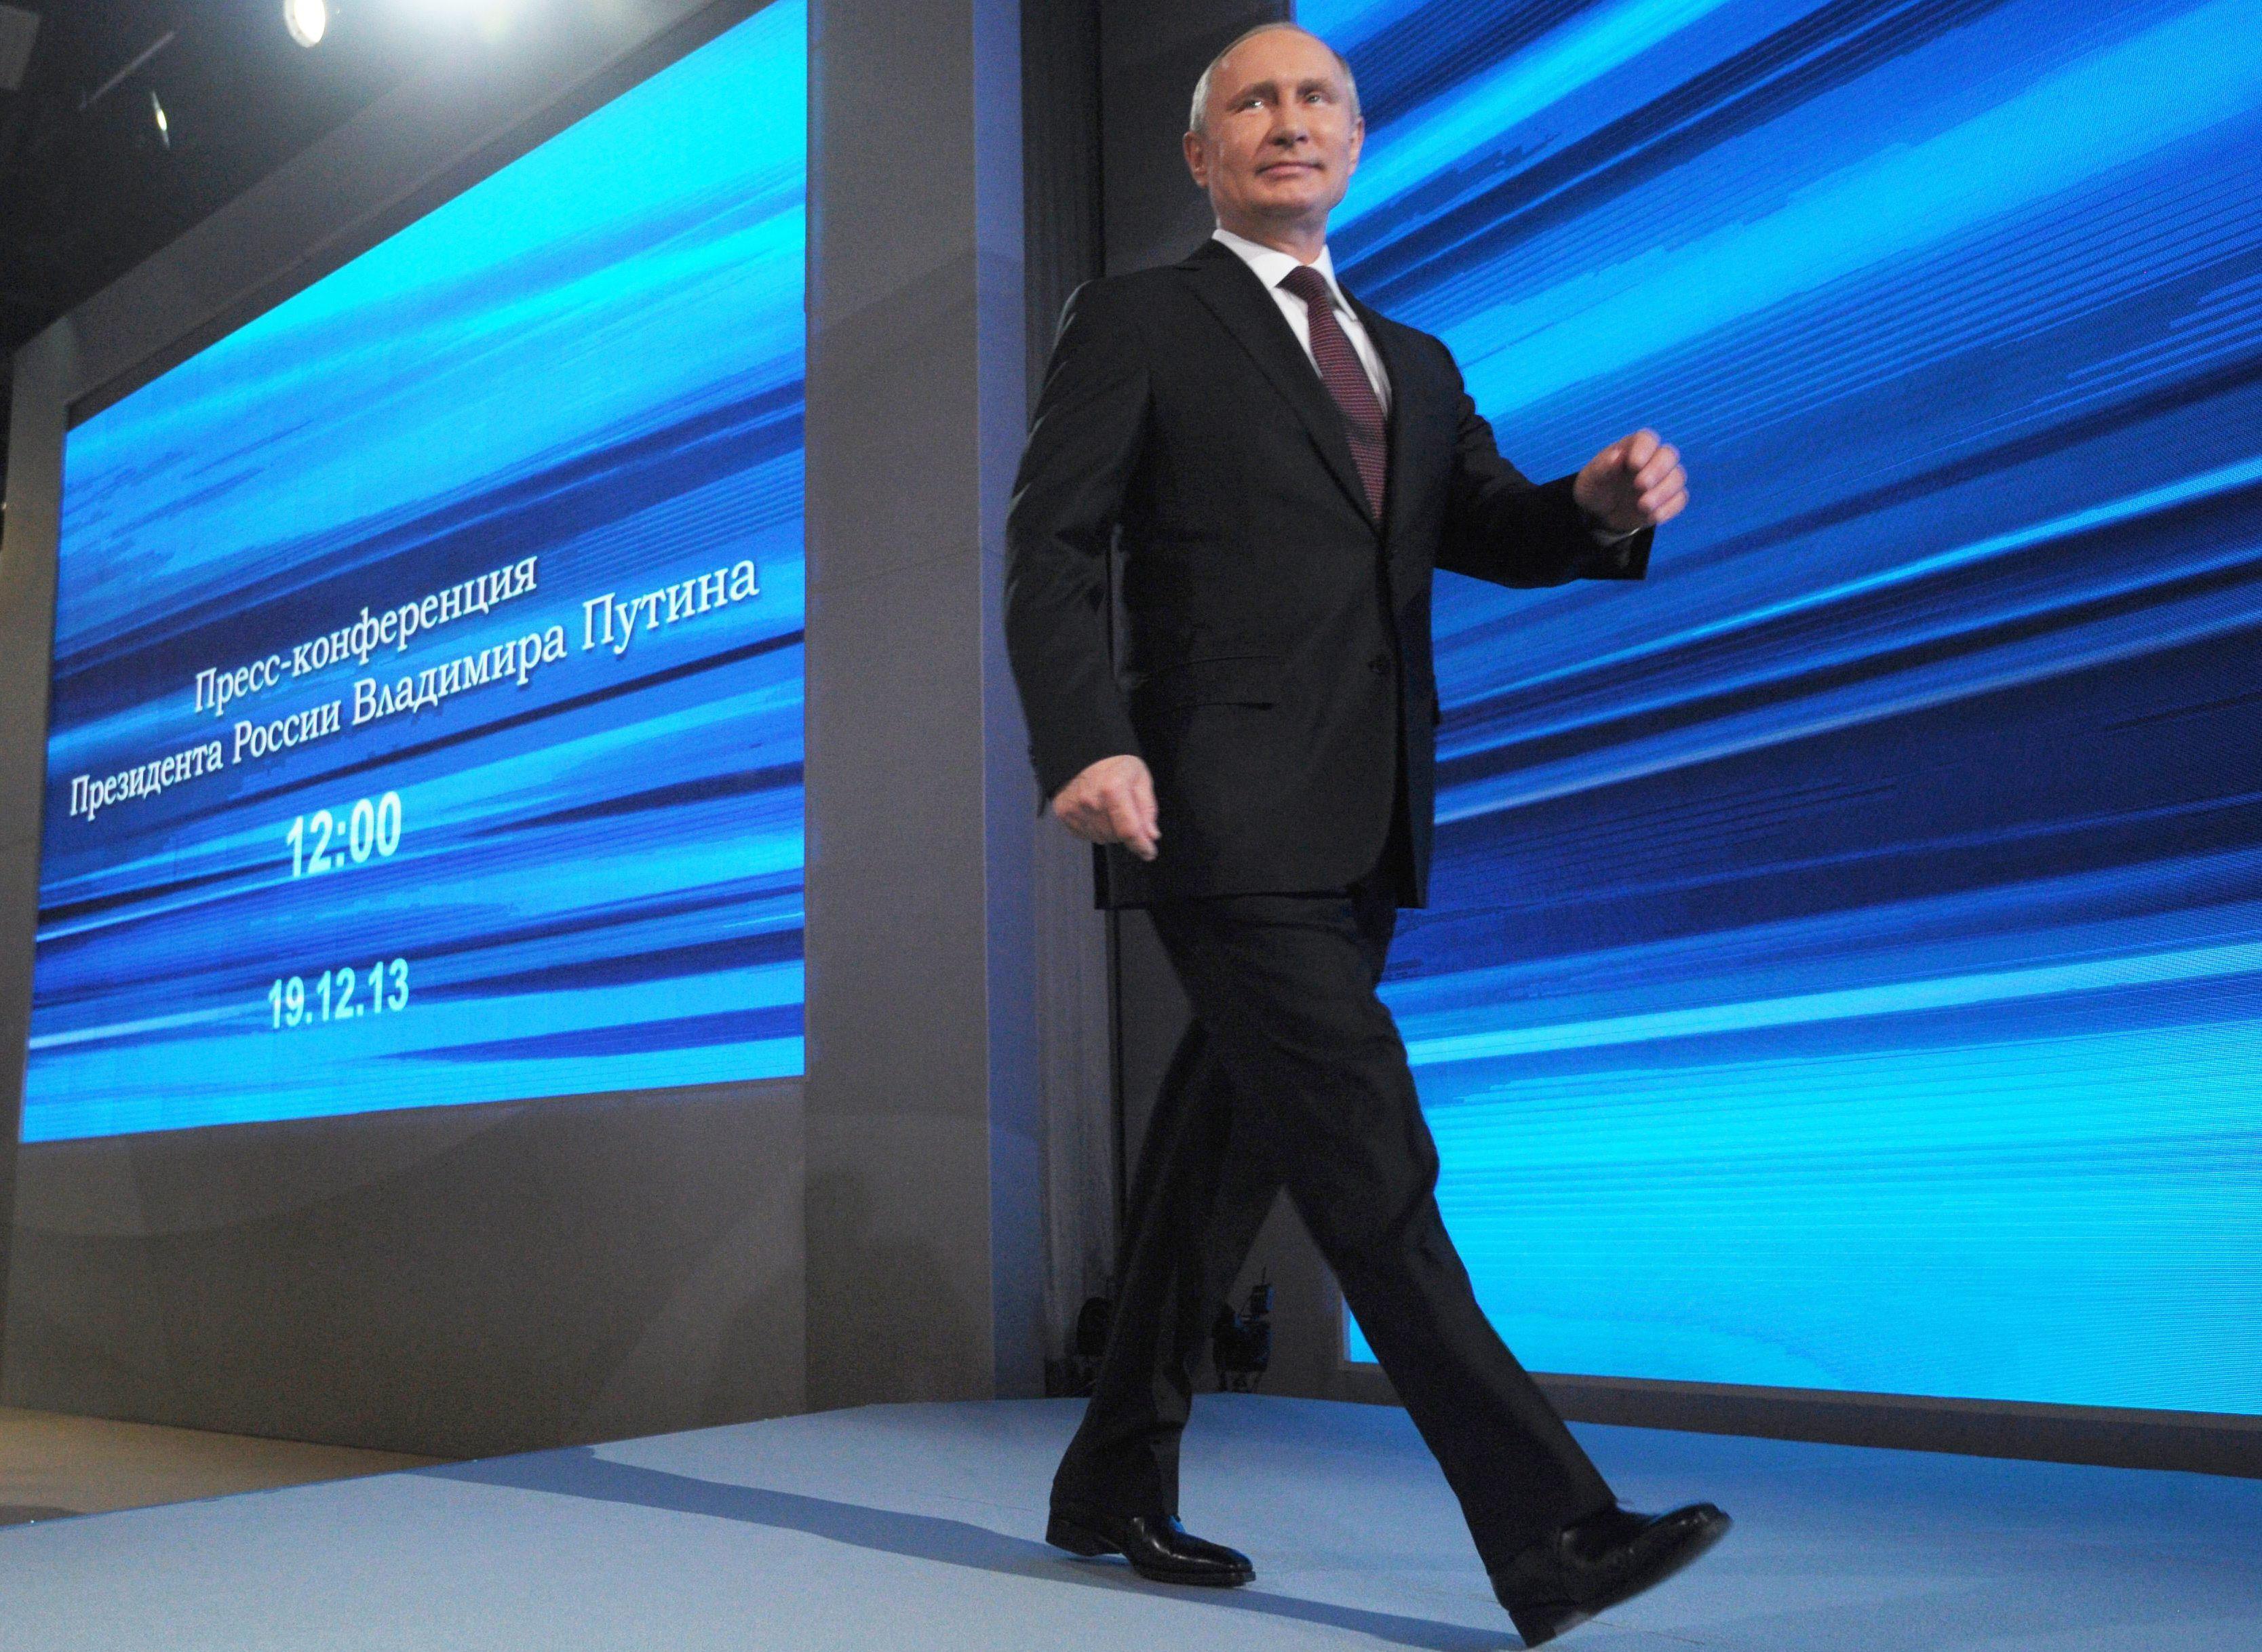 Putin anuncia que indultará en breve a Jodorkovski